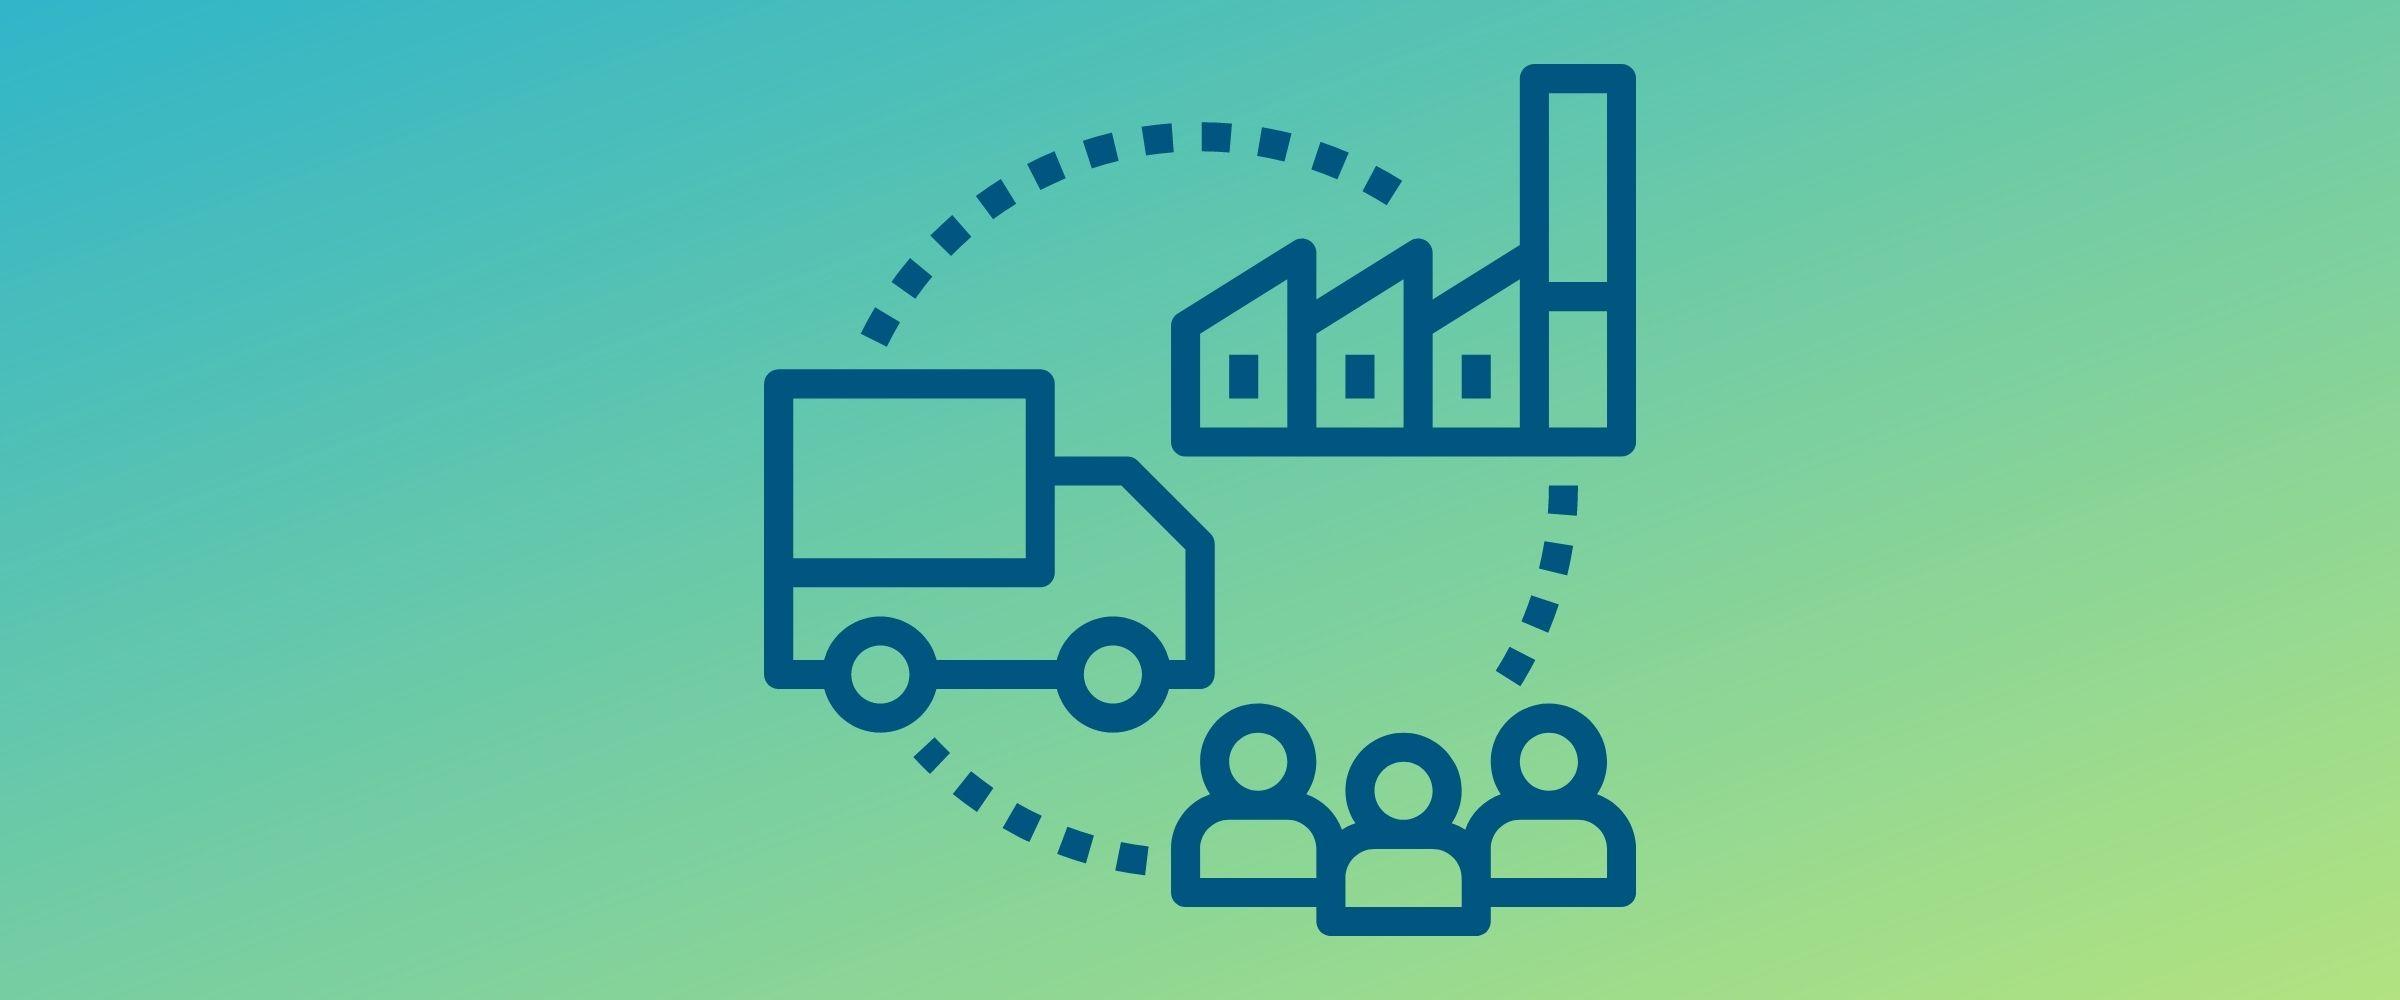 Global supply chain breakdown